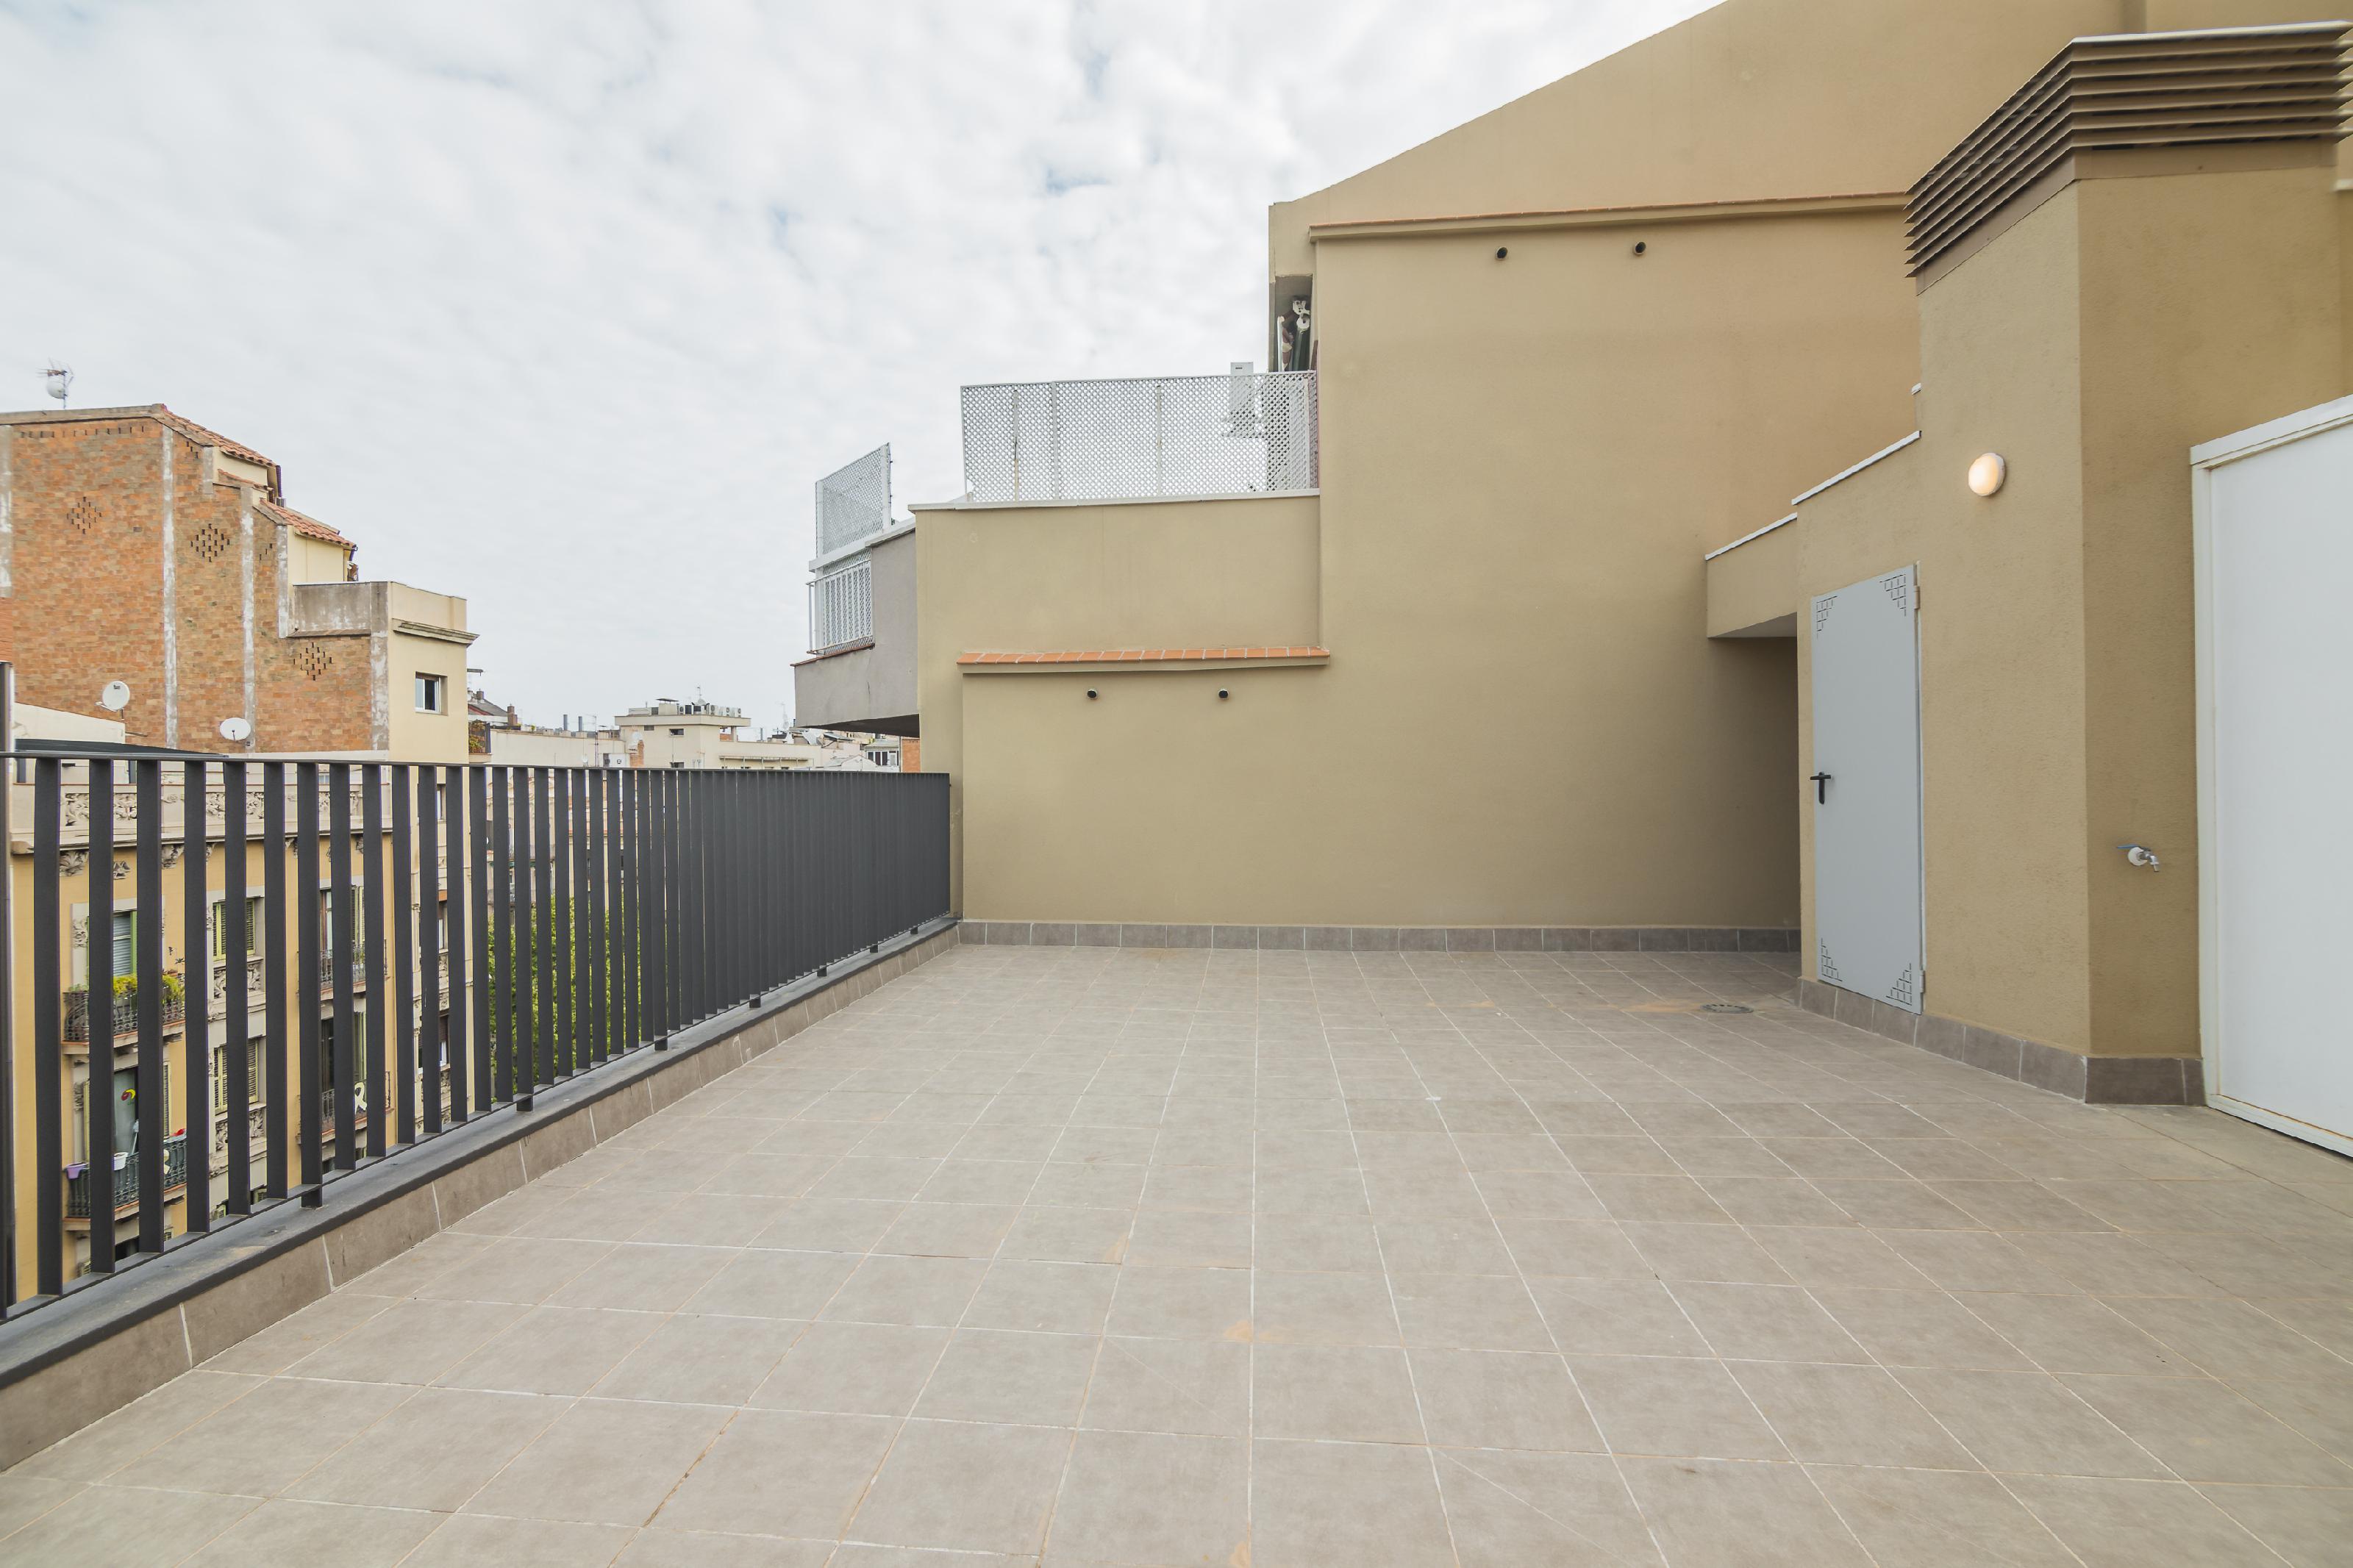 249860 Flat for sale in Eixample, Nova Esquerra Eixample 5